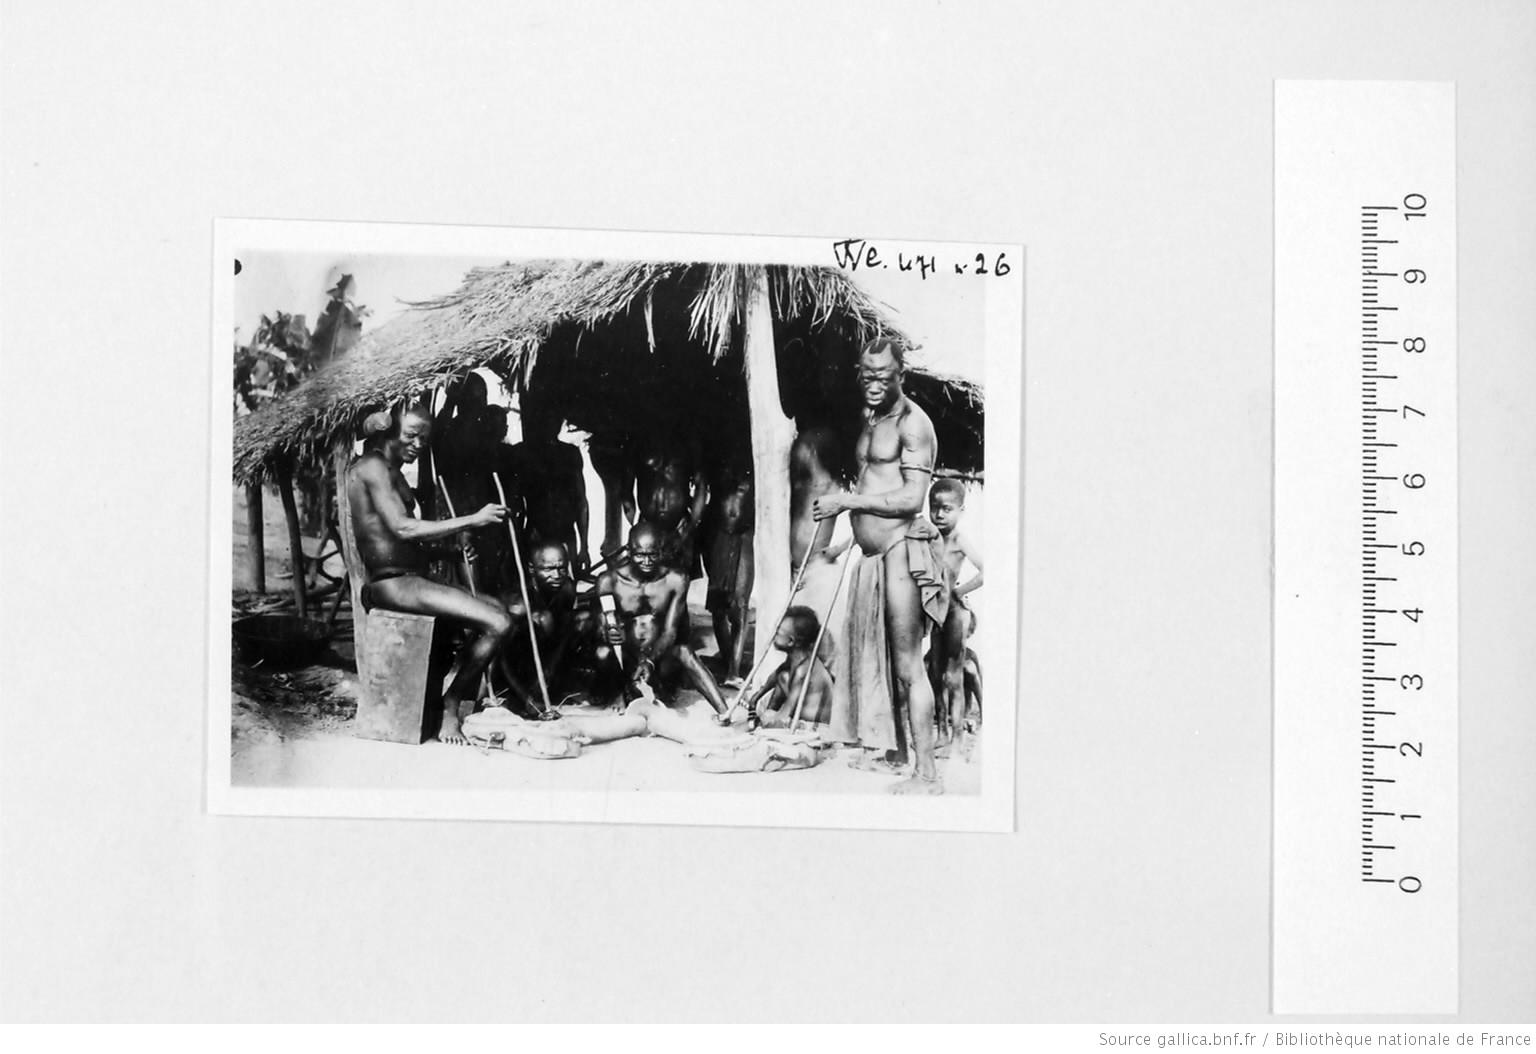 [39 phot. d'A.E.F. en 1924. Enregistré en 1936] - 26